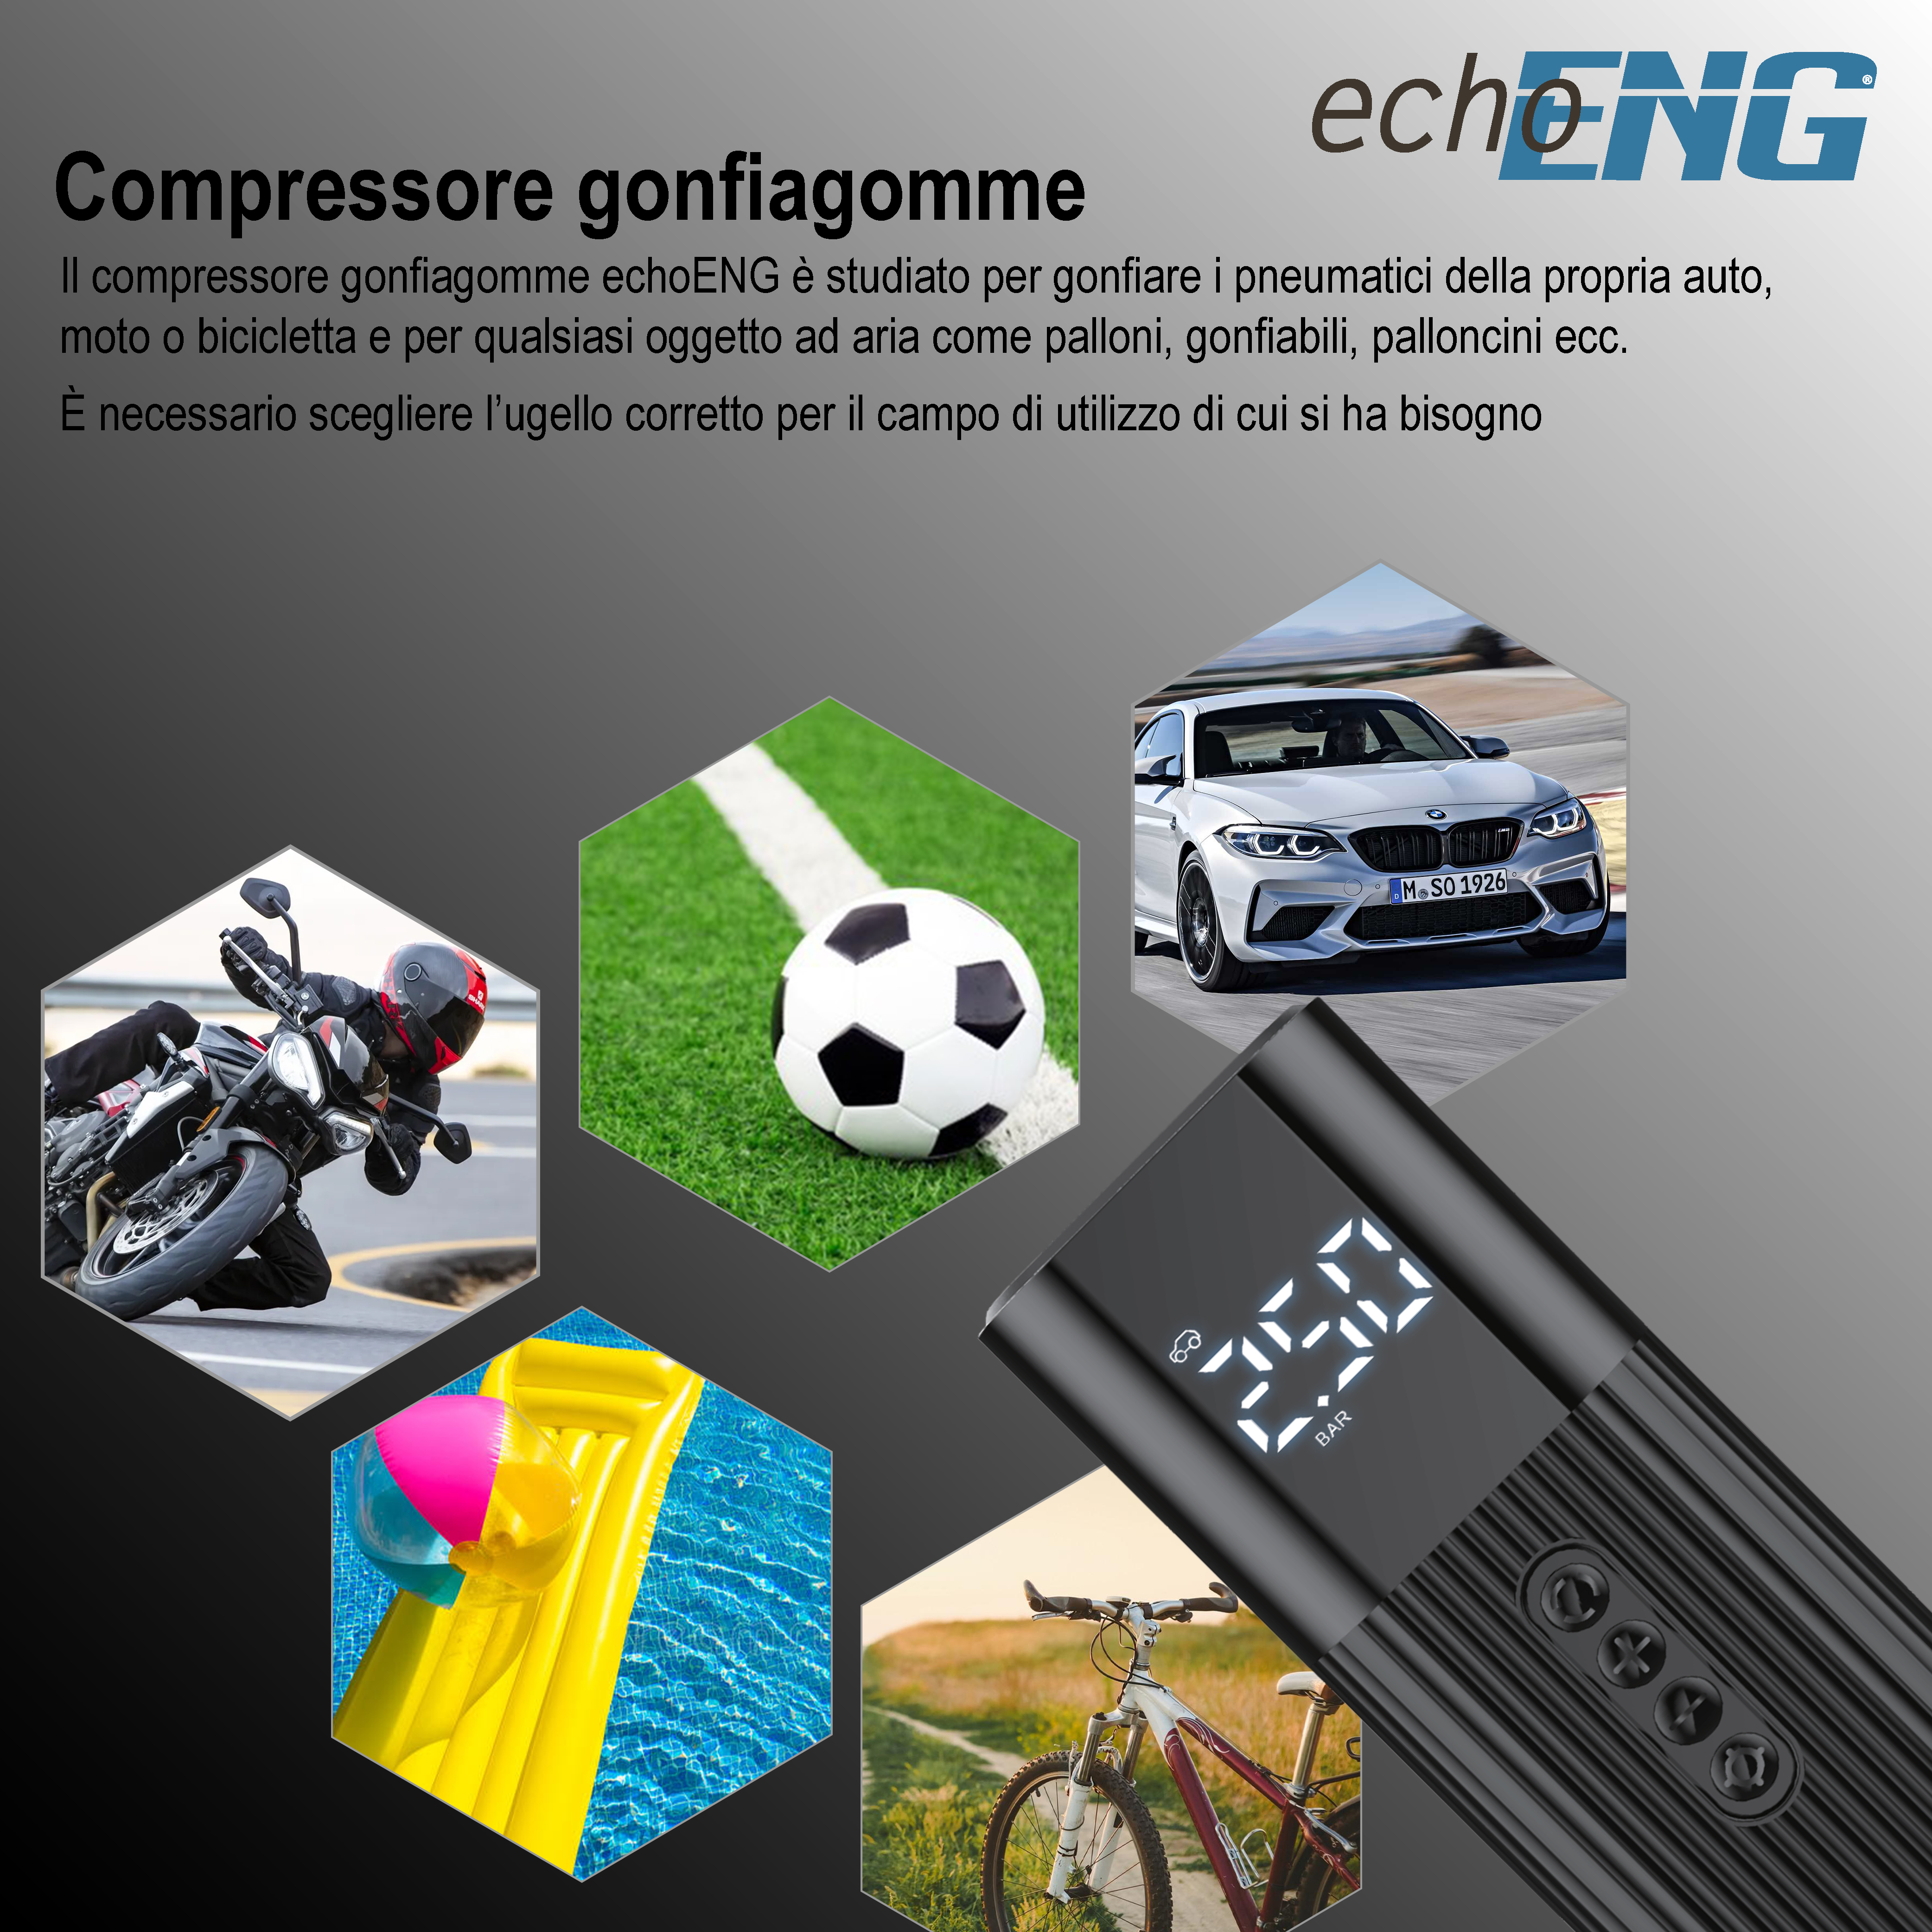 Kit avviatore di emergenza e compressore gonfiagomme - echoENG - UM 90 AVGG